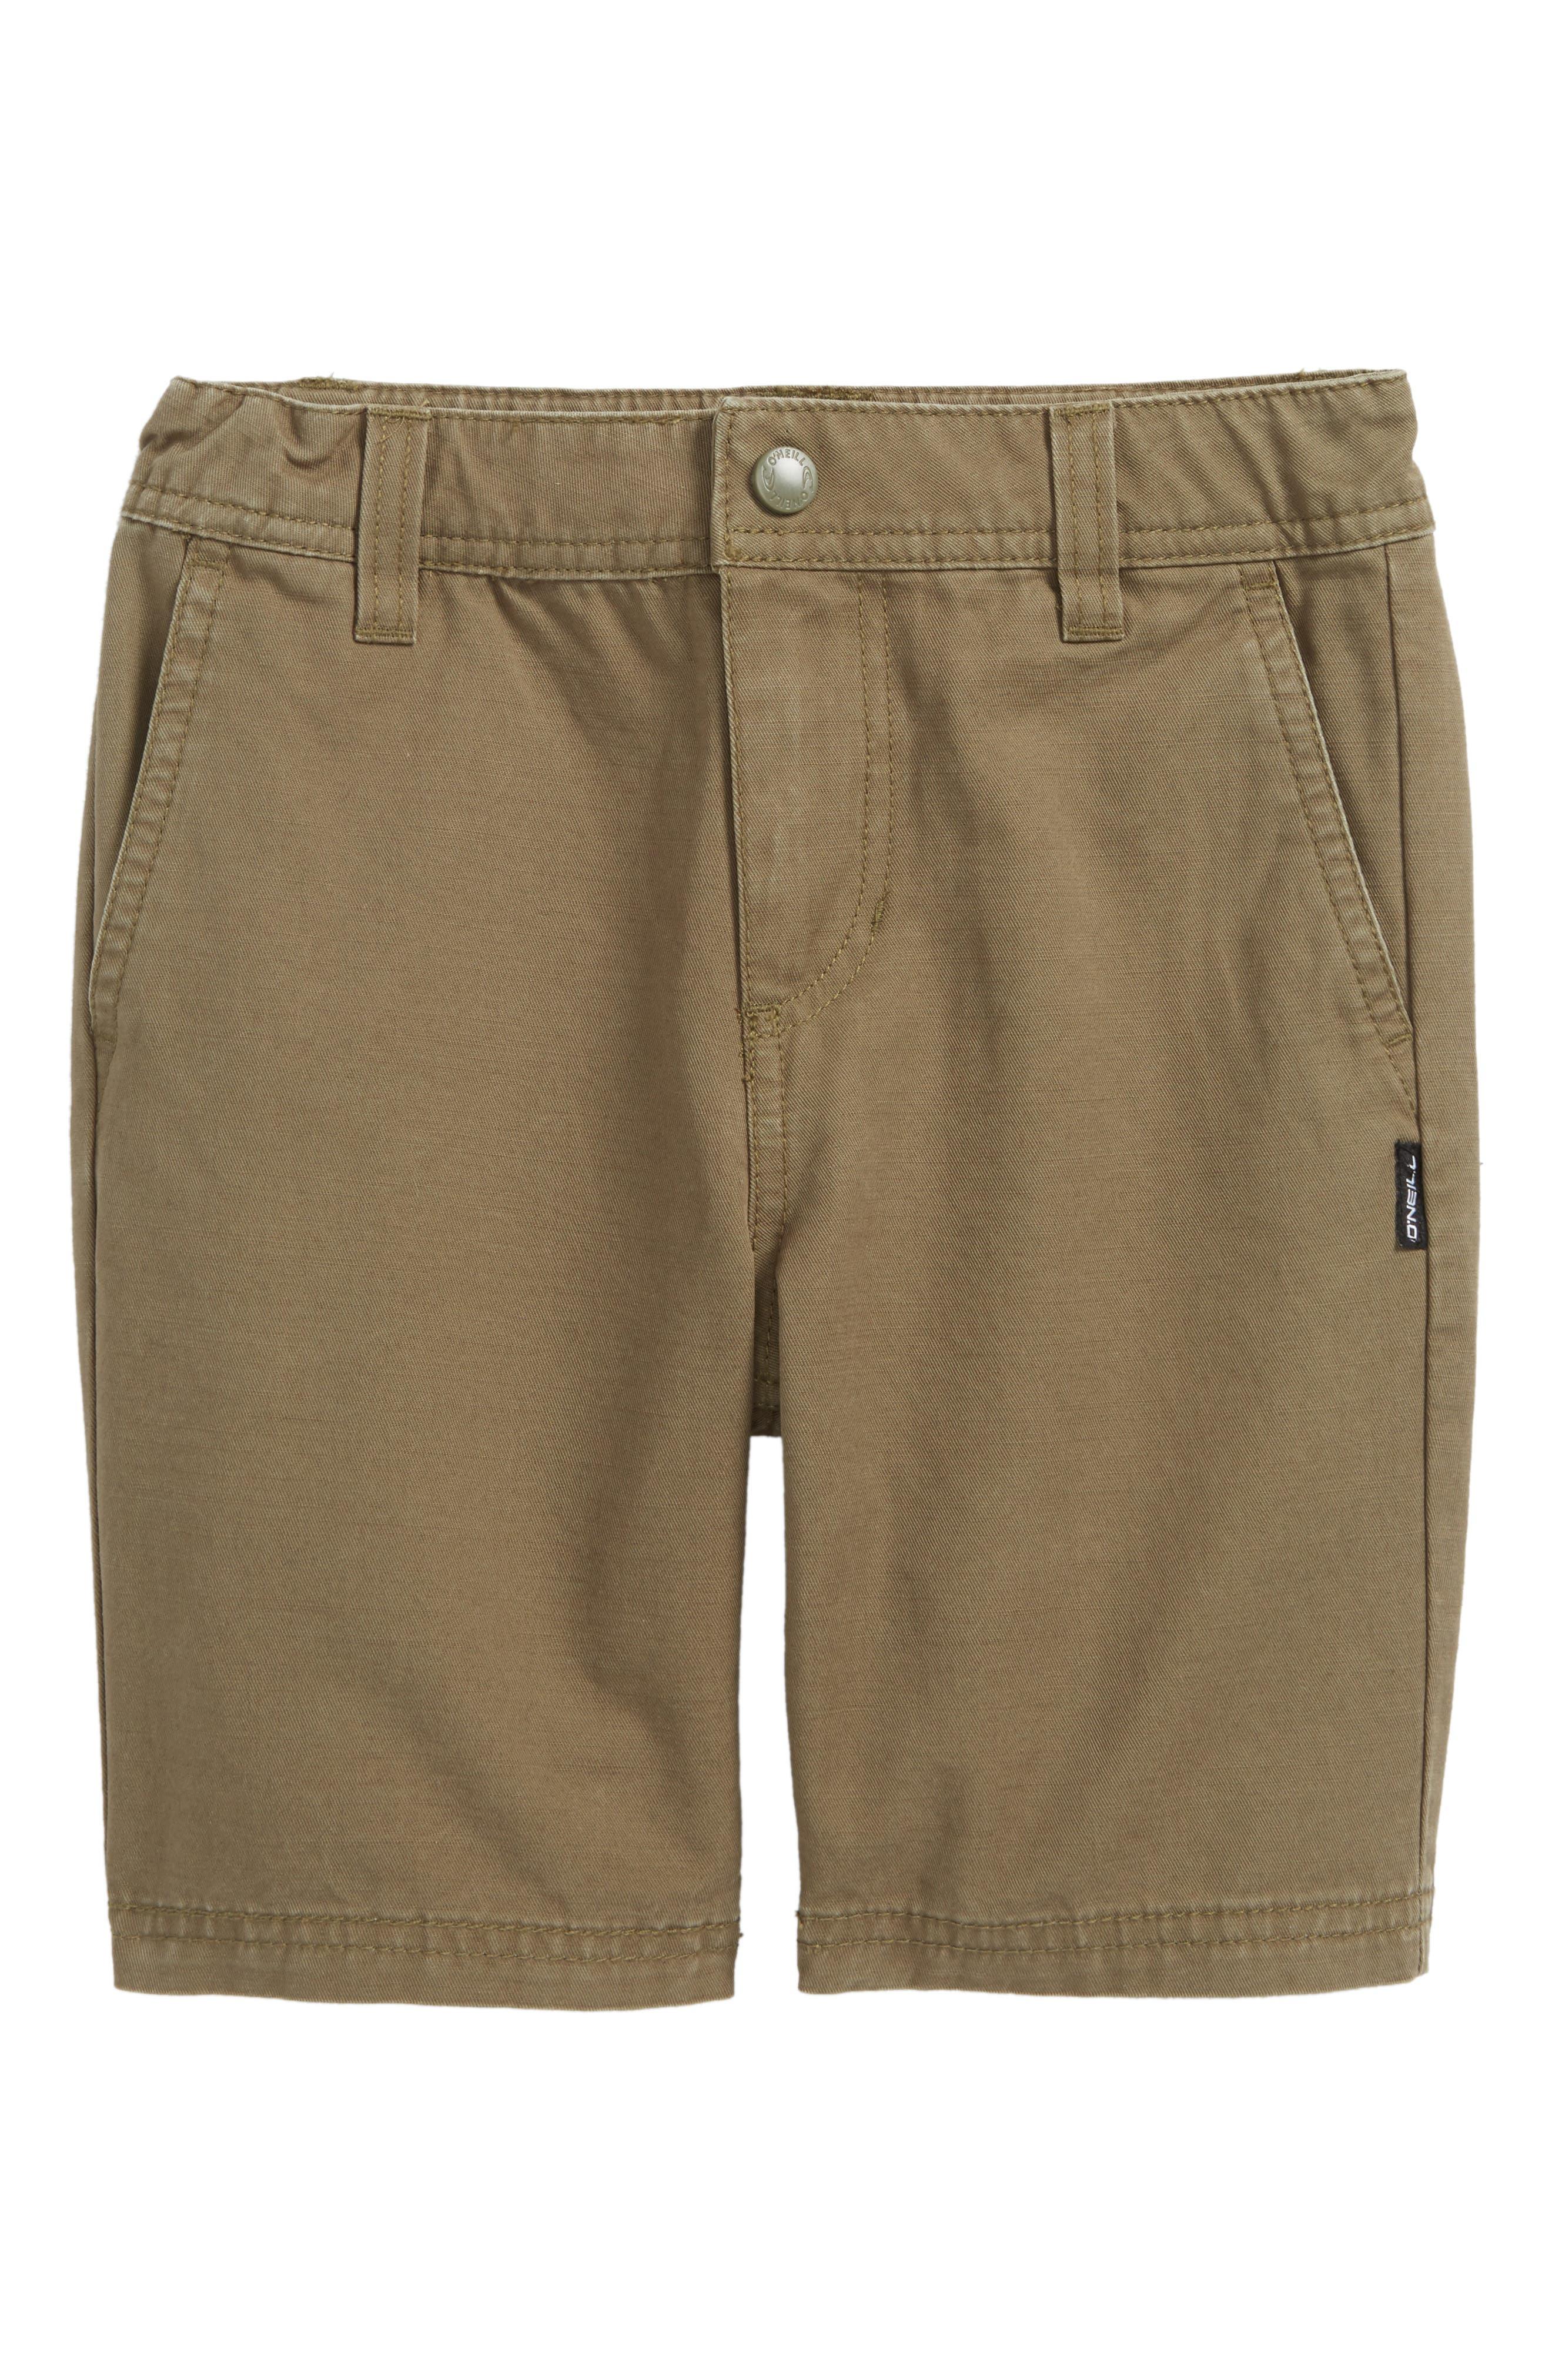 Alternate Image 1 Selected - O'Neill Jay Chino Shorts (Toddler Boys)